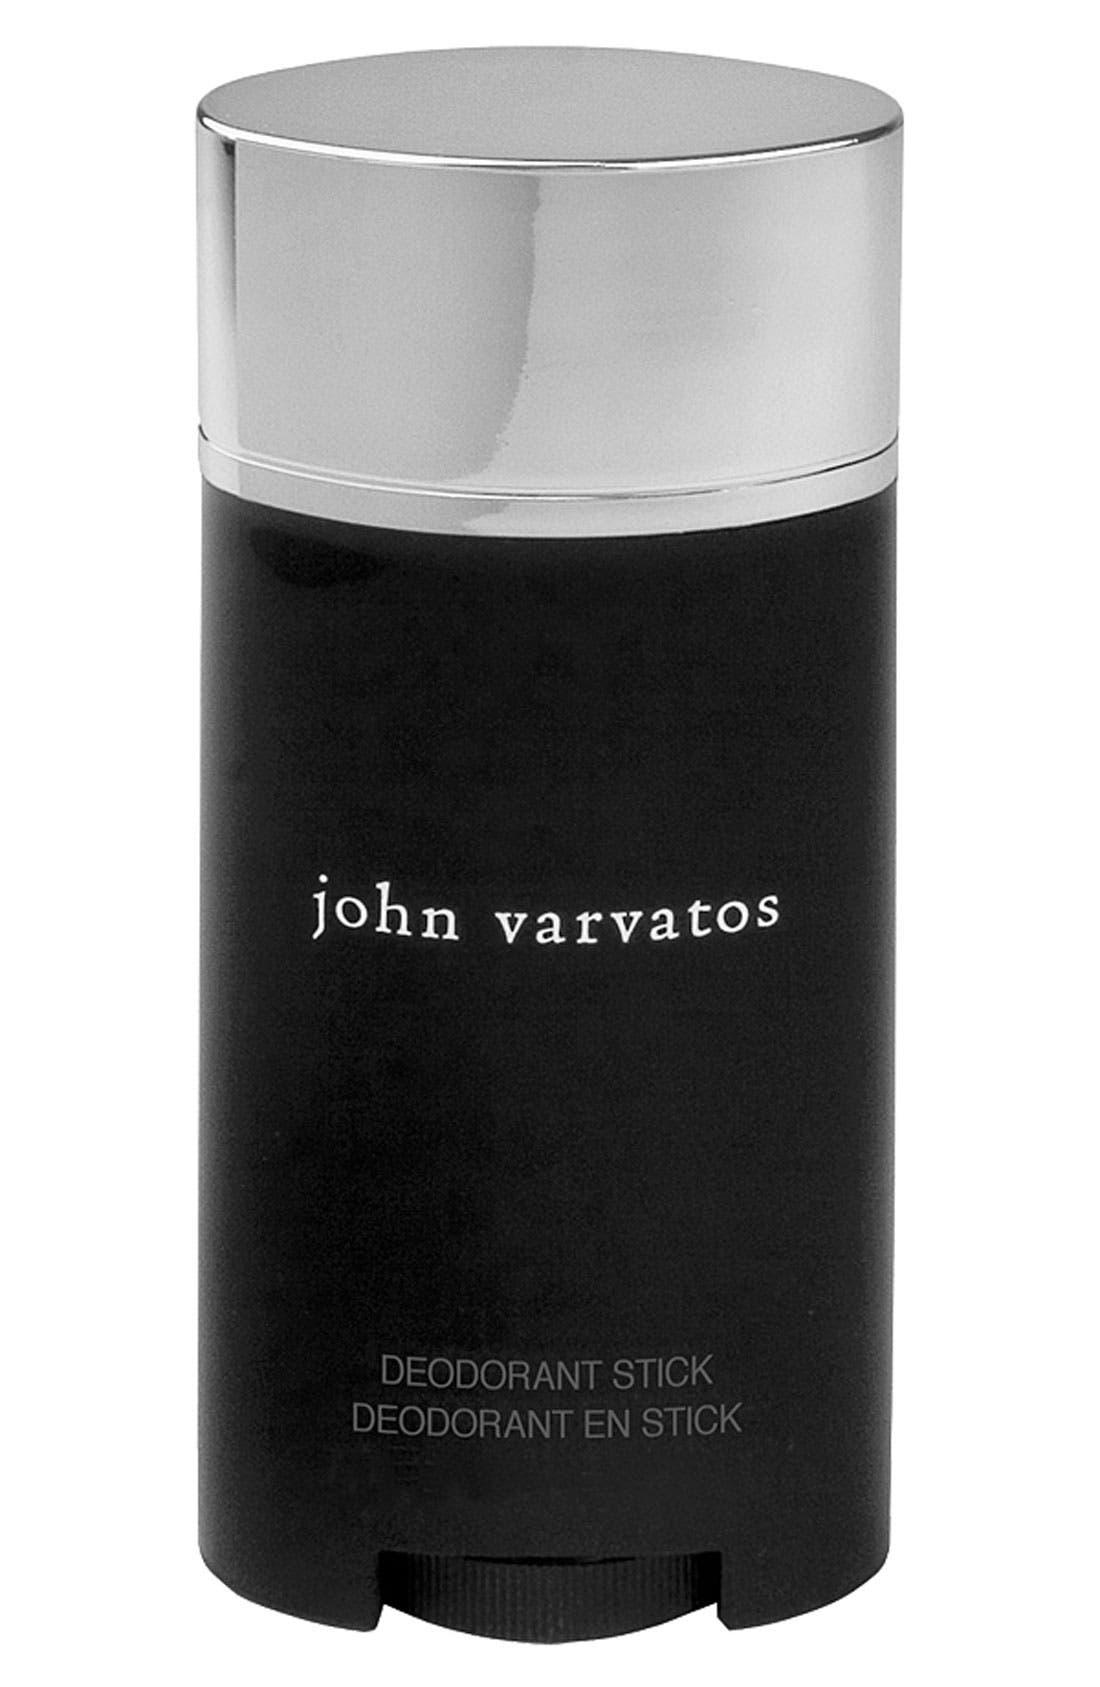 John Varvatos 'Classic' Deodorant Stick,                             Main thumbnail 1, color,                             NO COLOR